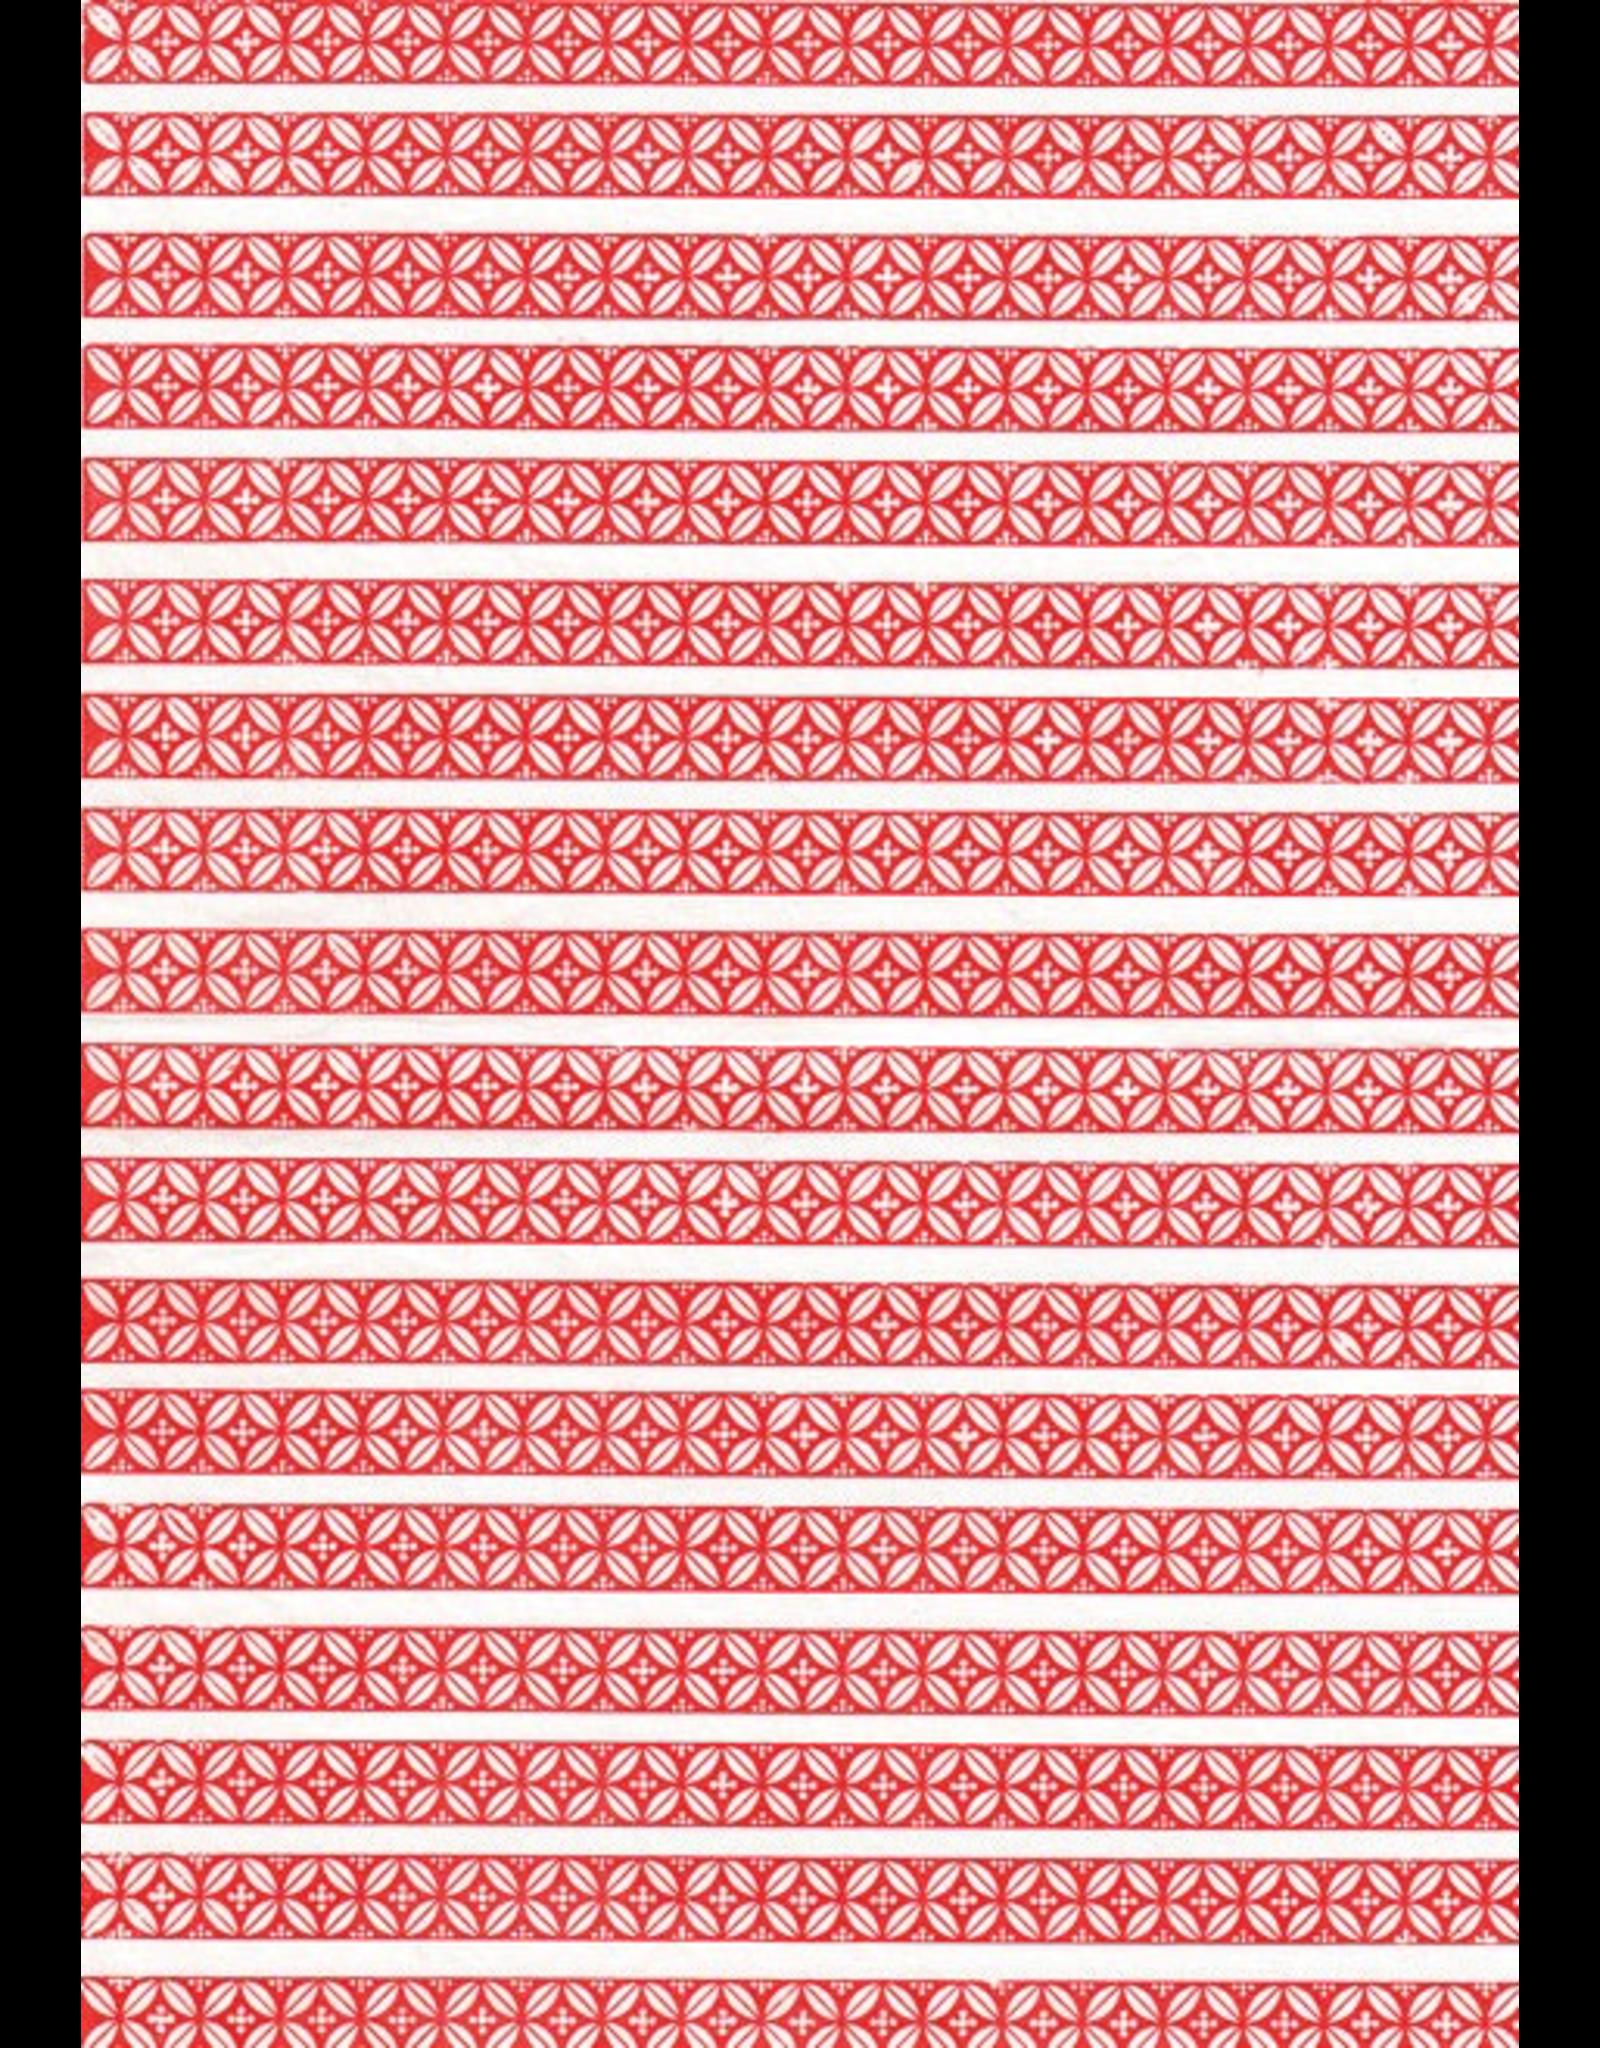 Sanbao Pattern decal 2 (underglaze decal - 16cm x 22cm)